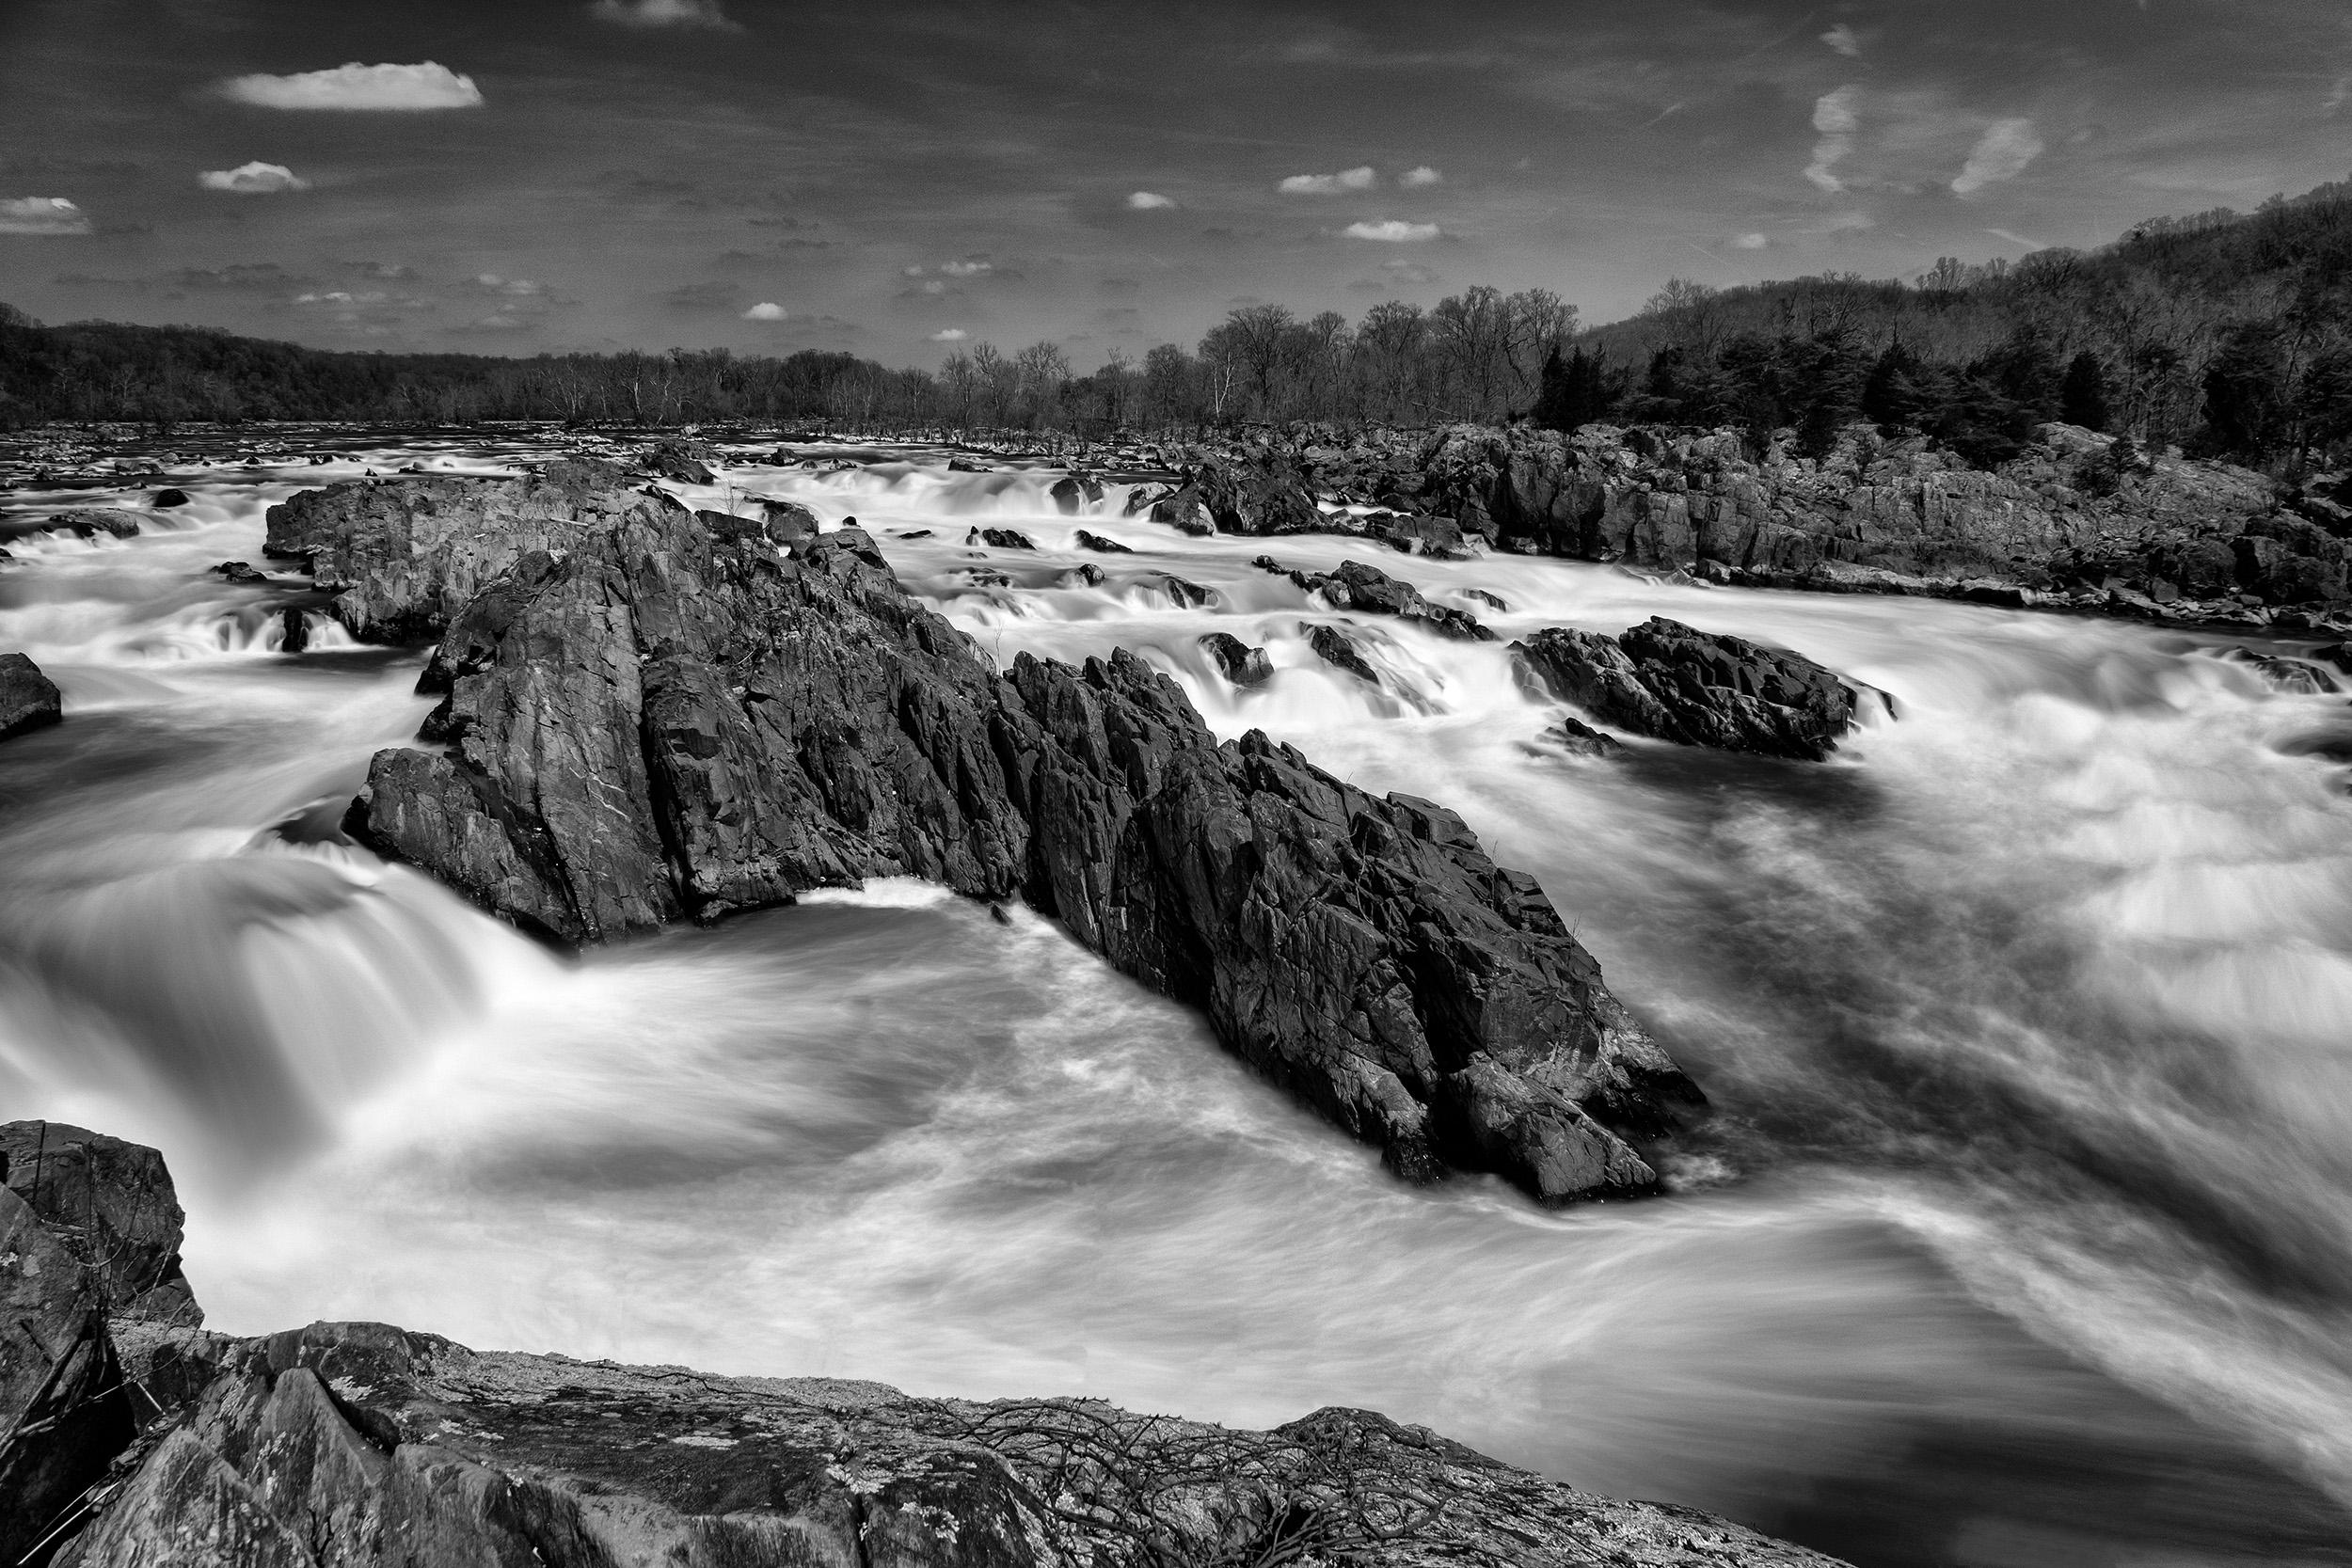 190406 VA Great Falls  XT3 05-1 flt bw.jpg